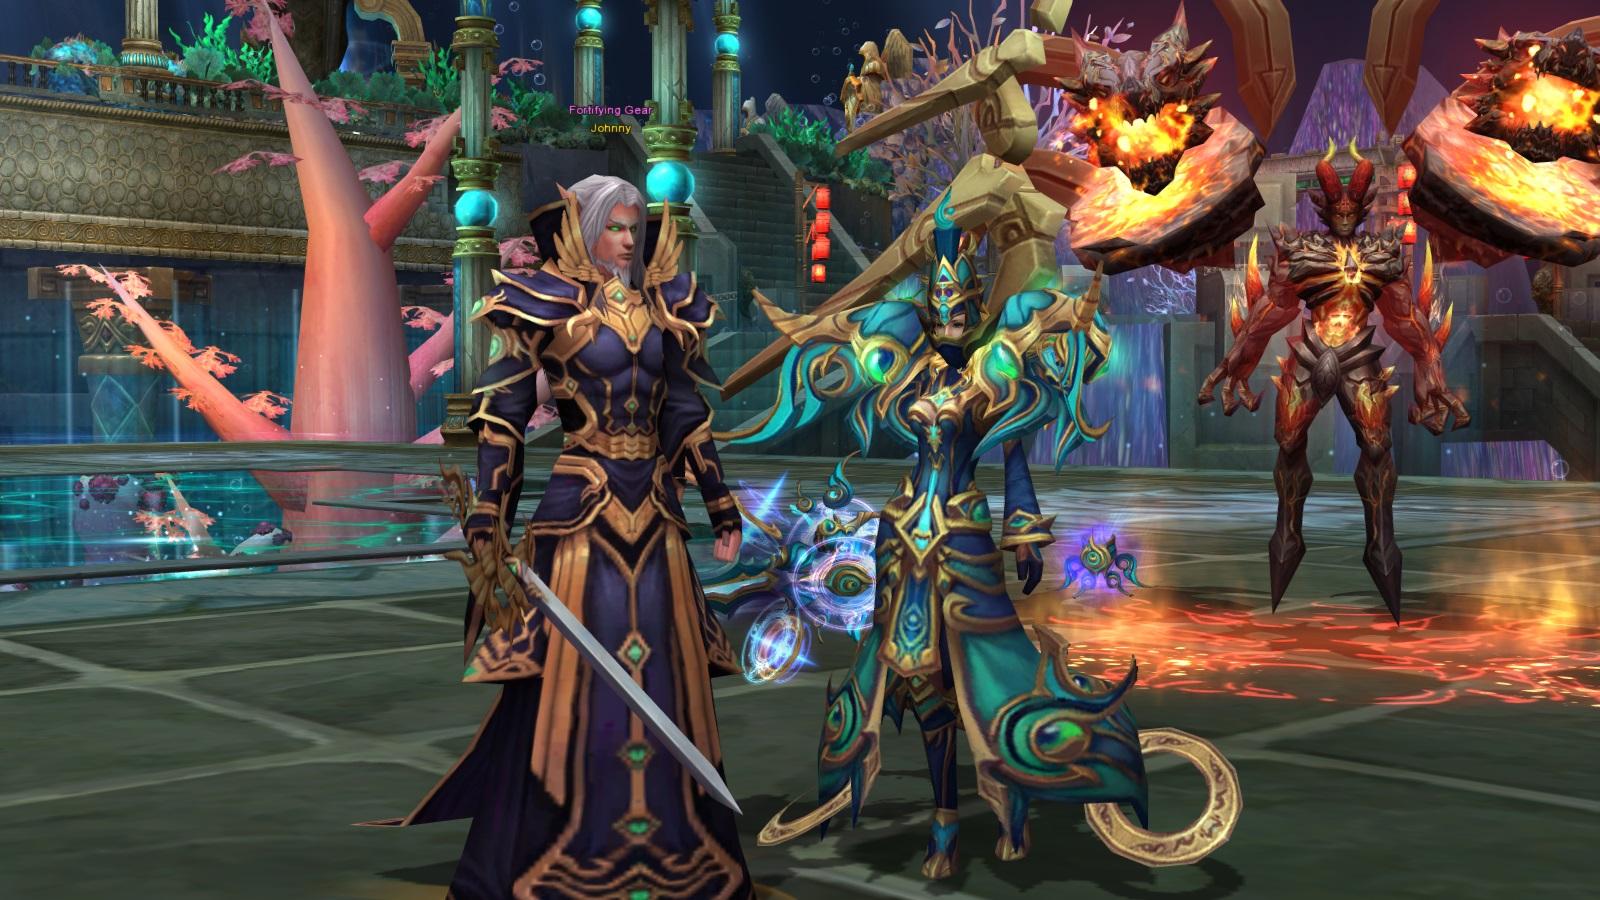 crystal battle free online game